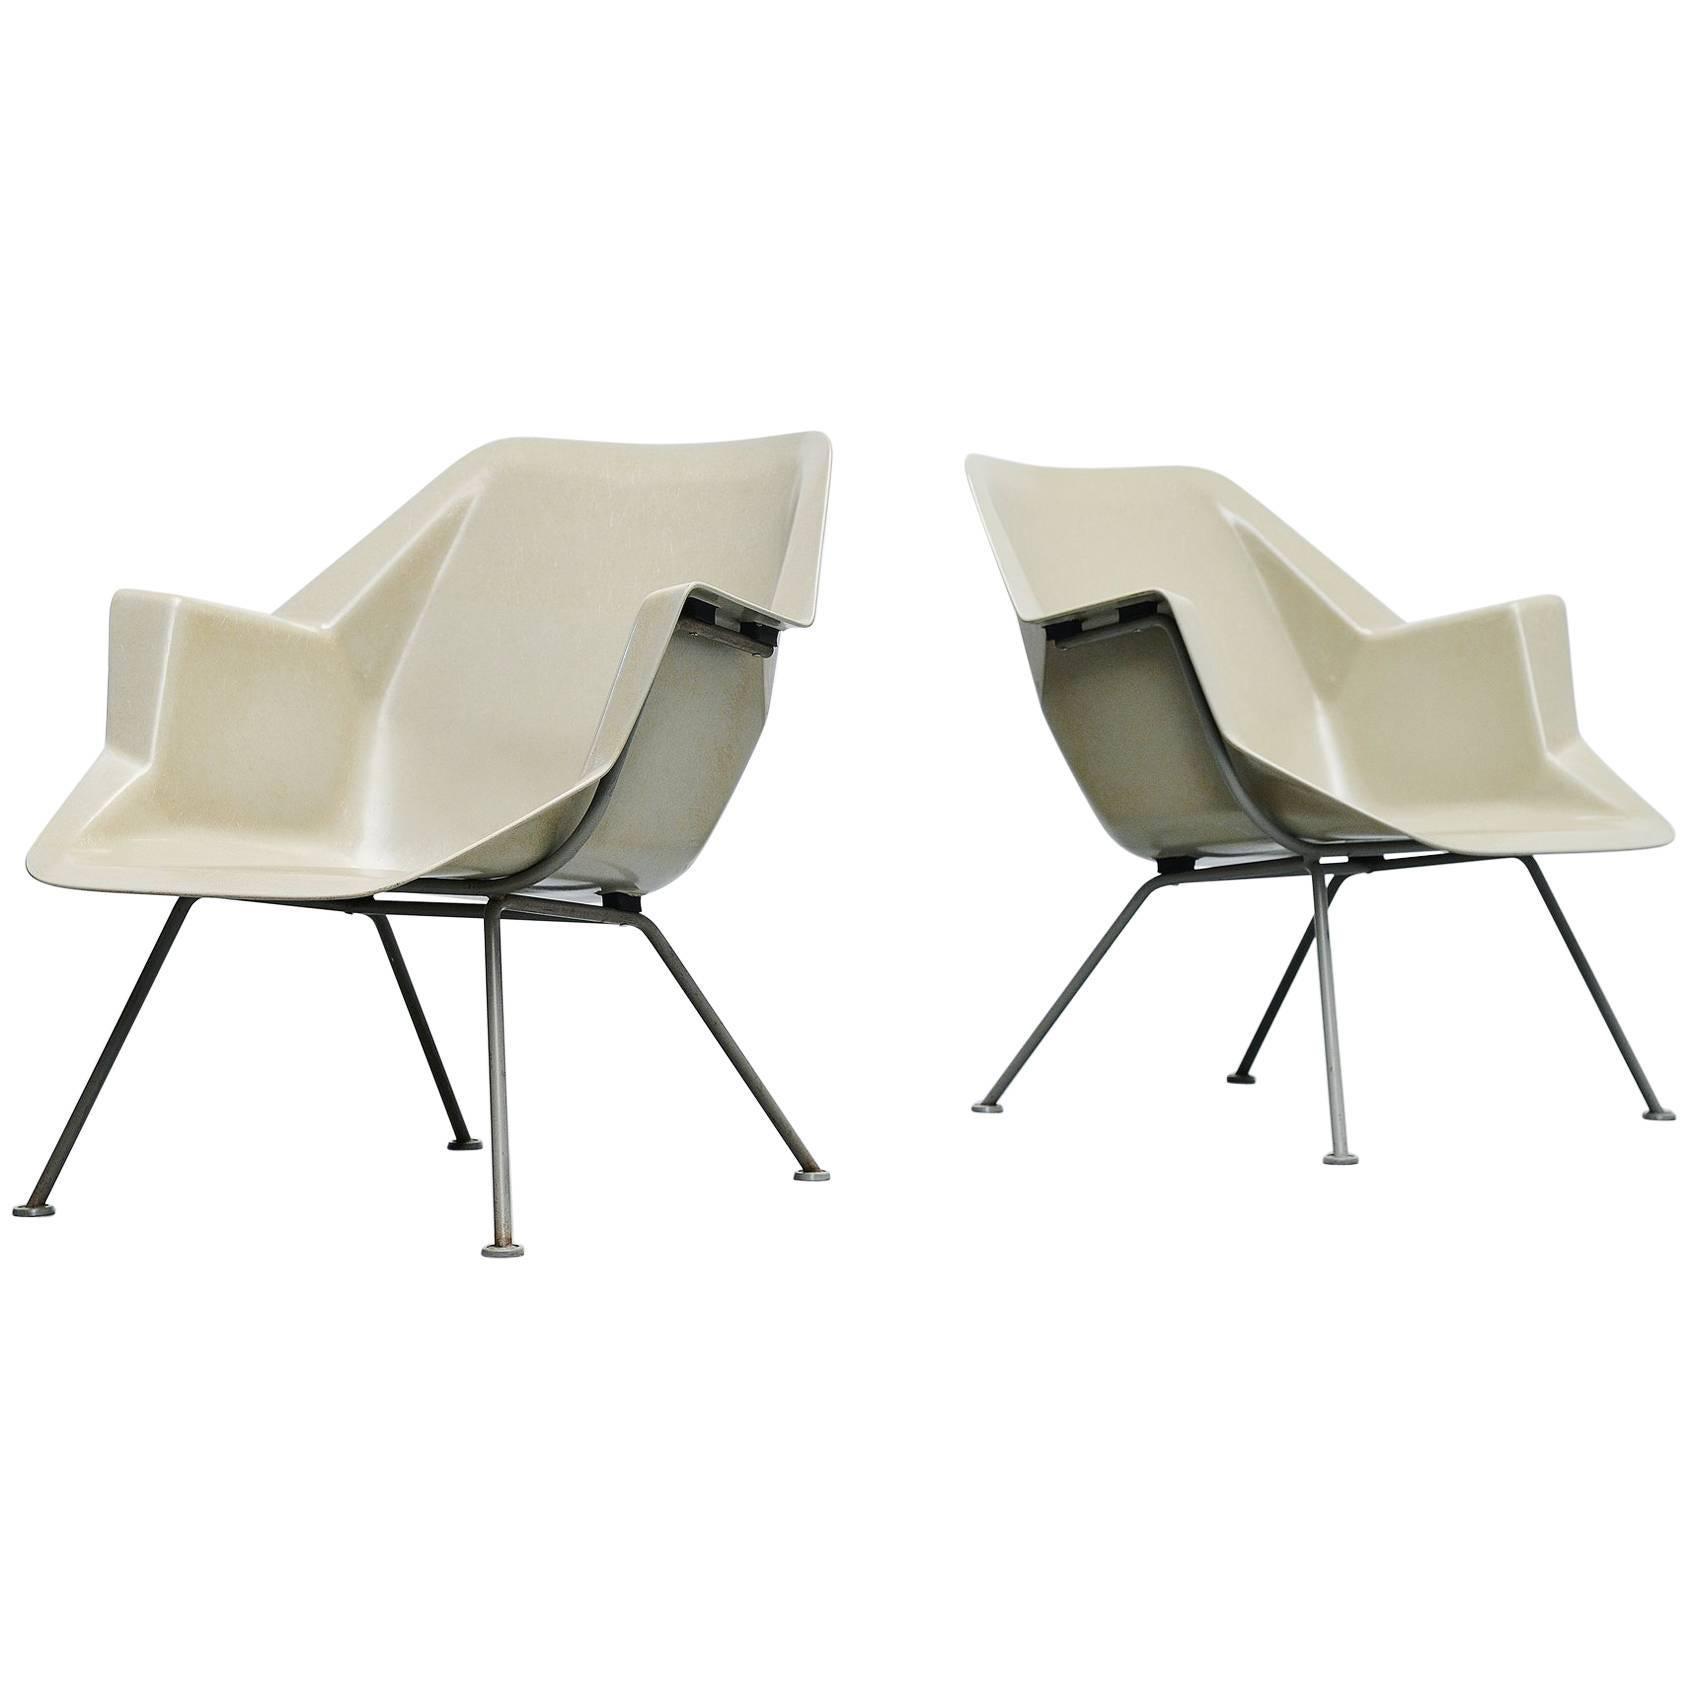 Wim Rietveld Polyester Chairs Model 416 Gispen, 1957